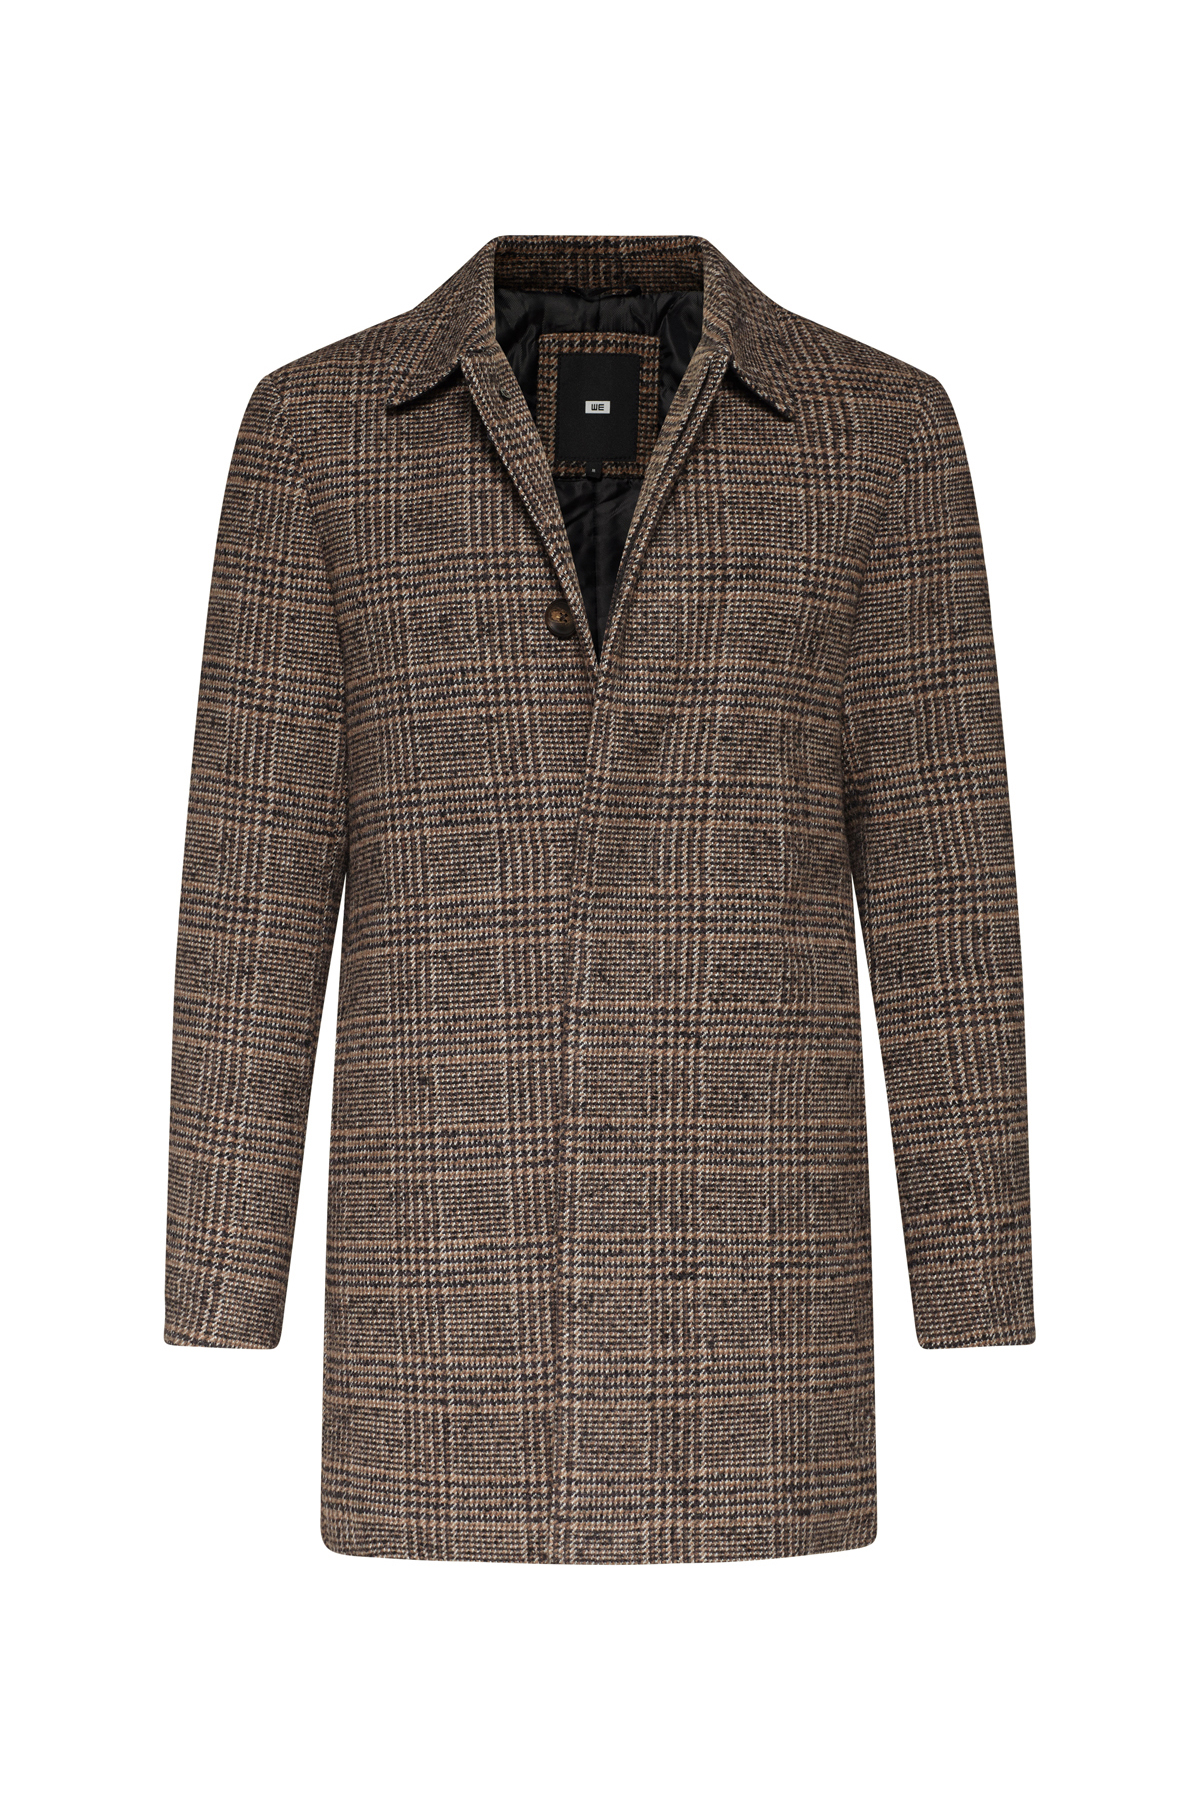 Heren geruite jas   94620726 WE Fashion